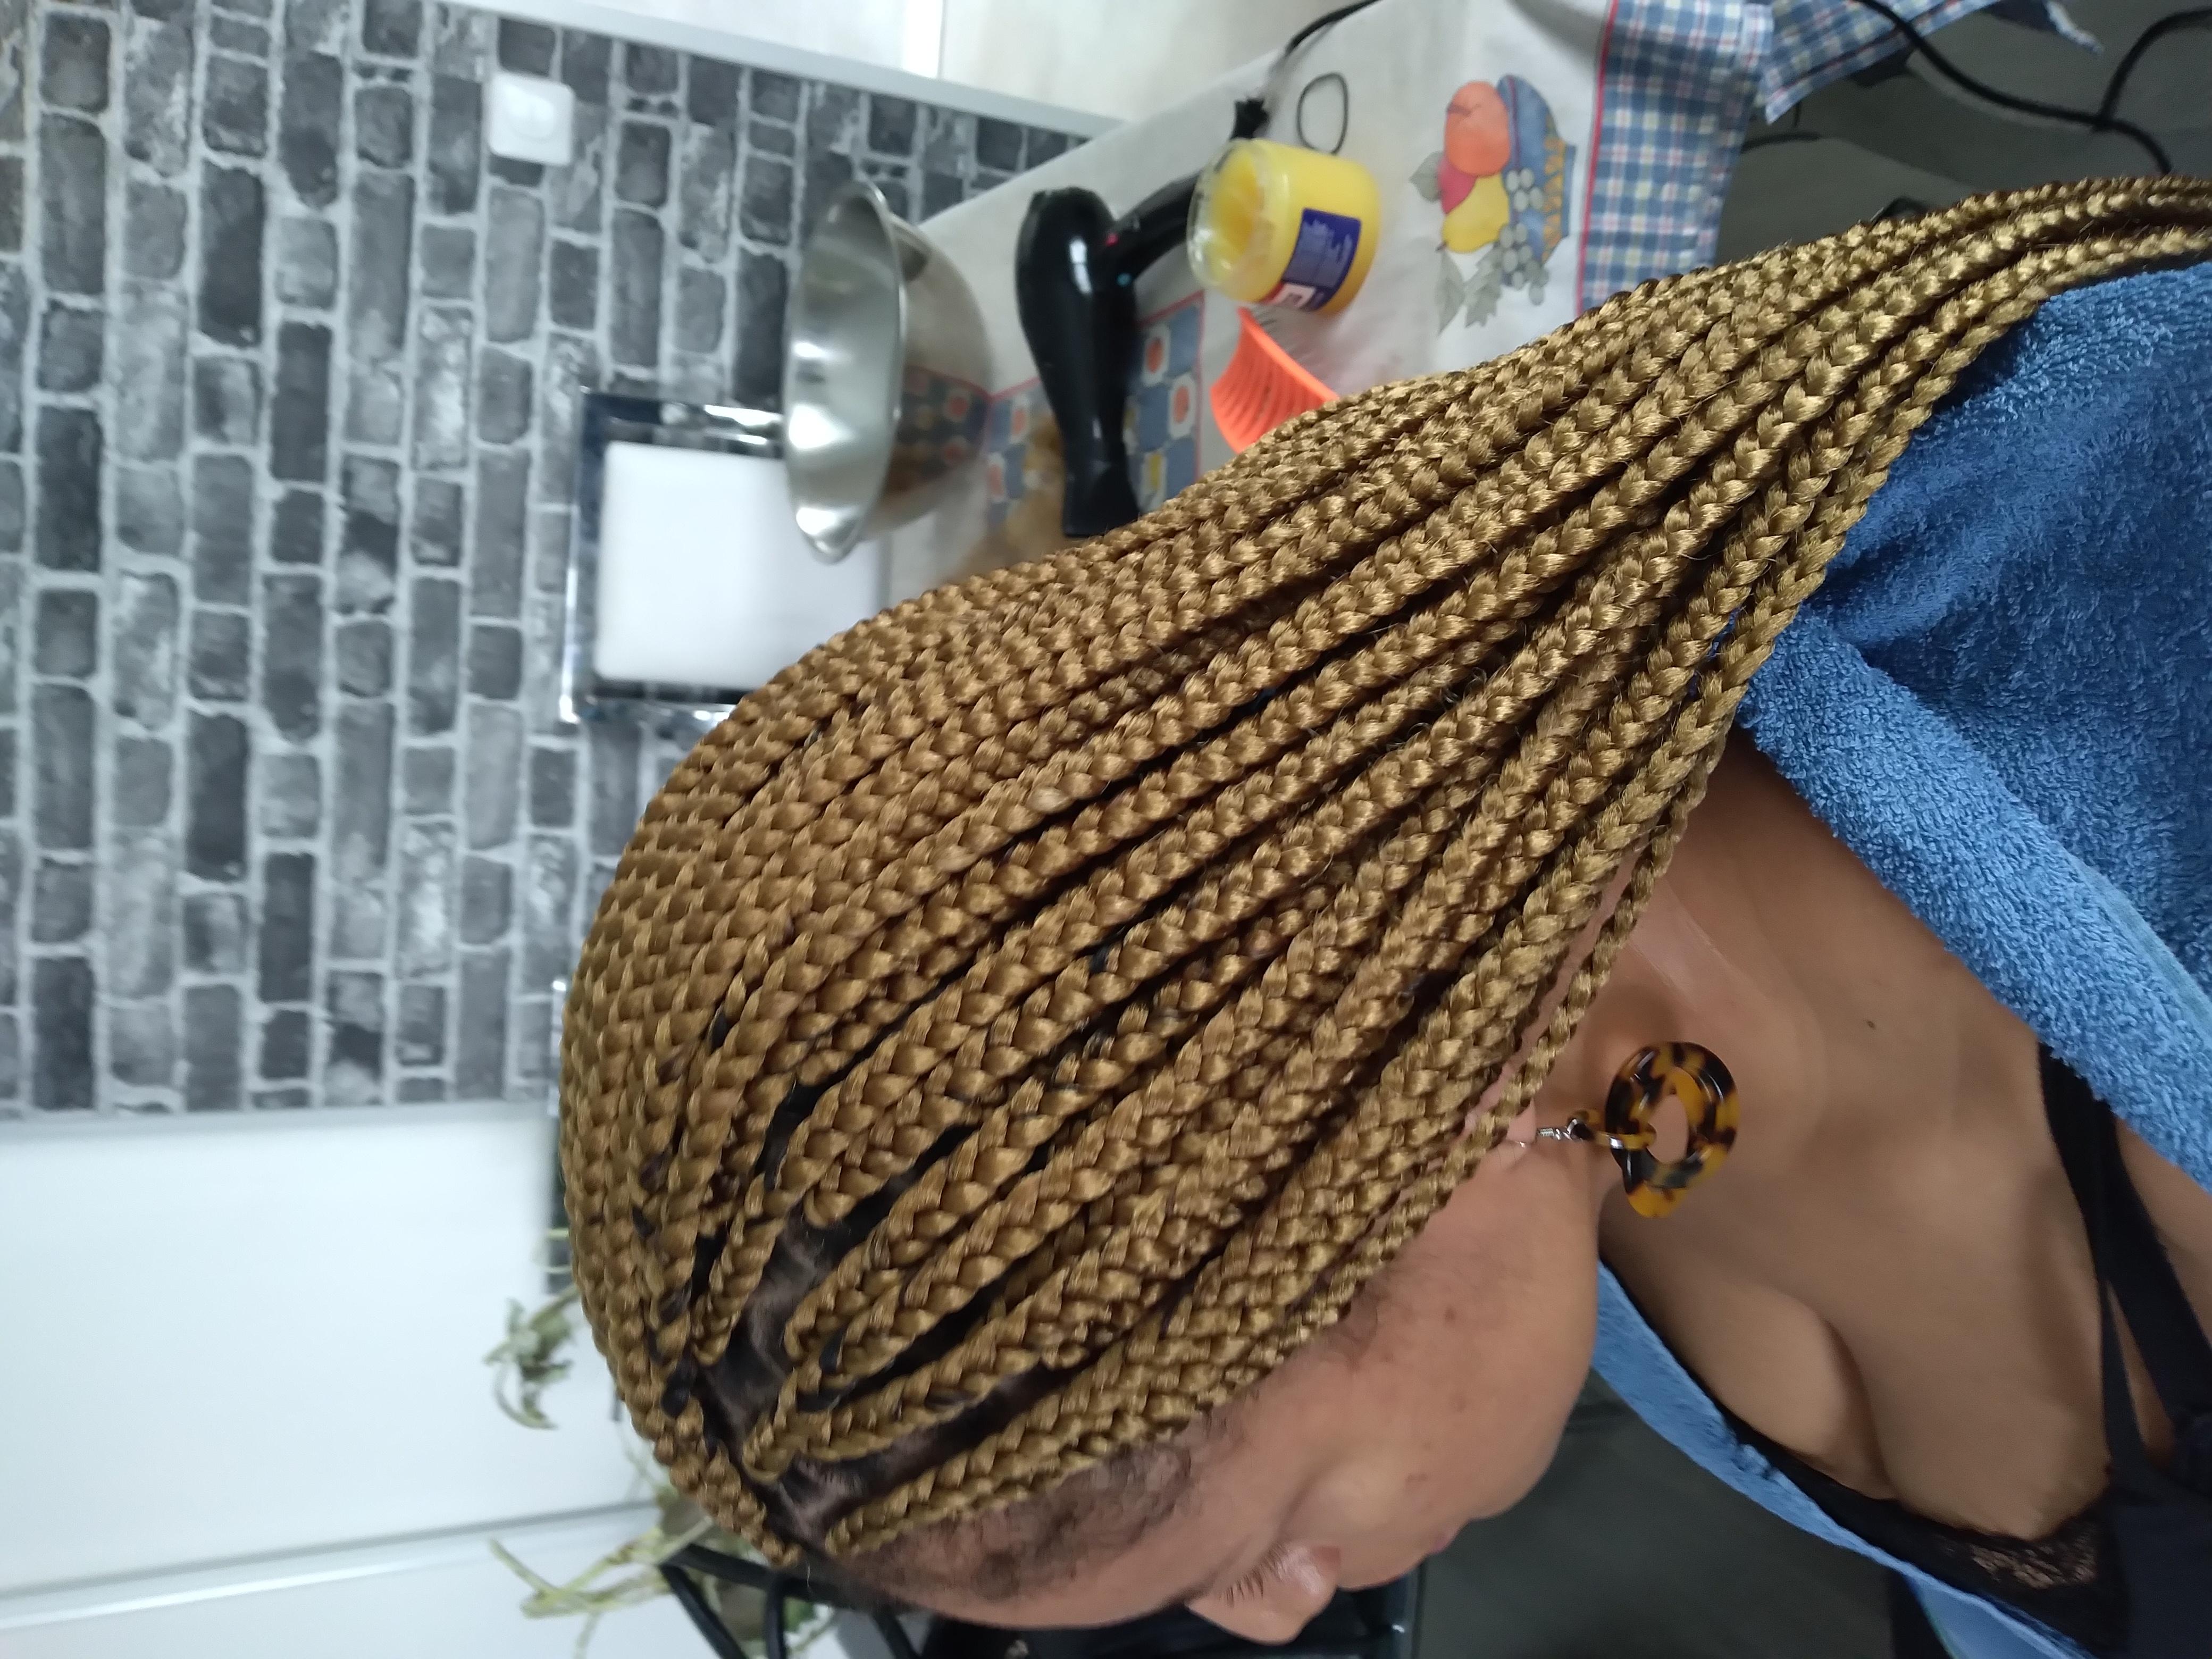 salon de coiffure afro tresse tresses box braids crochet braids vanilles tissages paris 75 77 78 91 92 93 94 95 FUZTRBAA